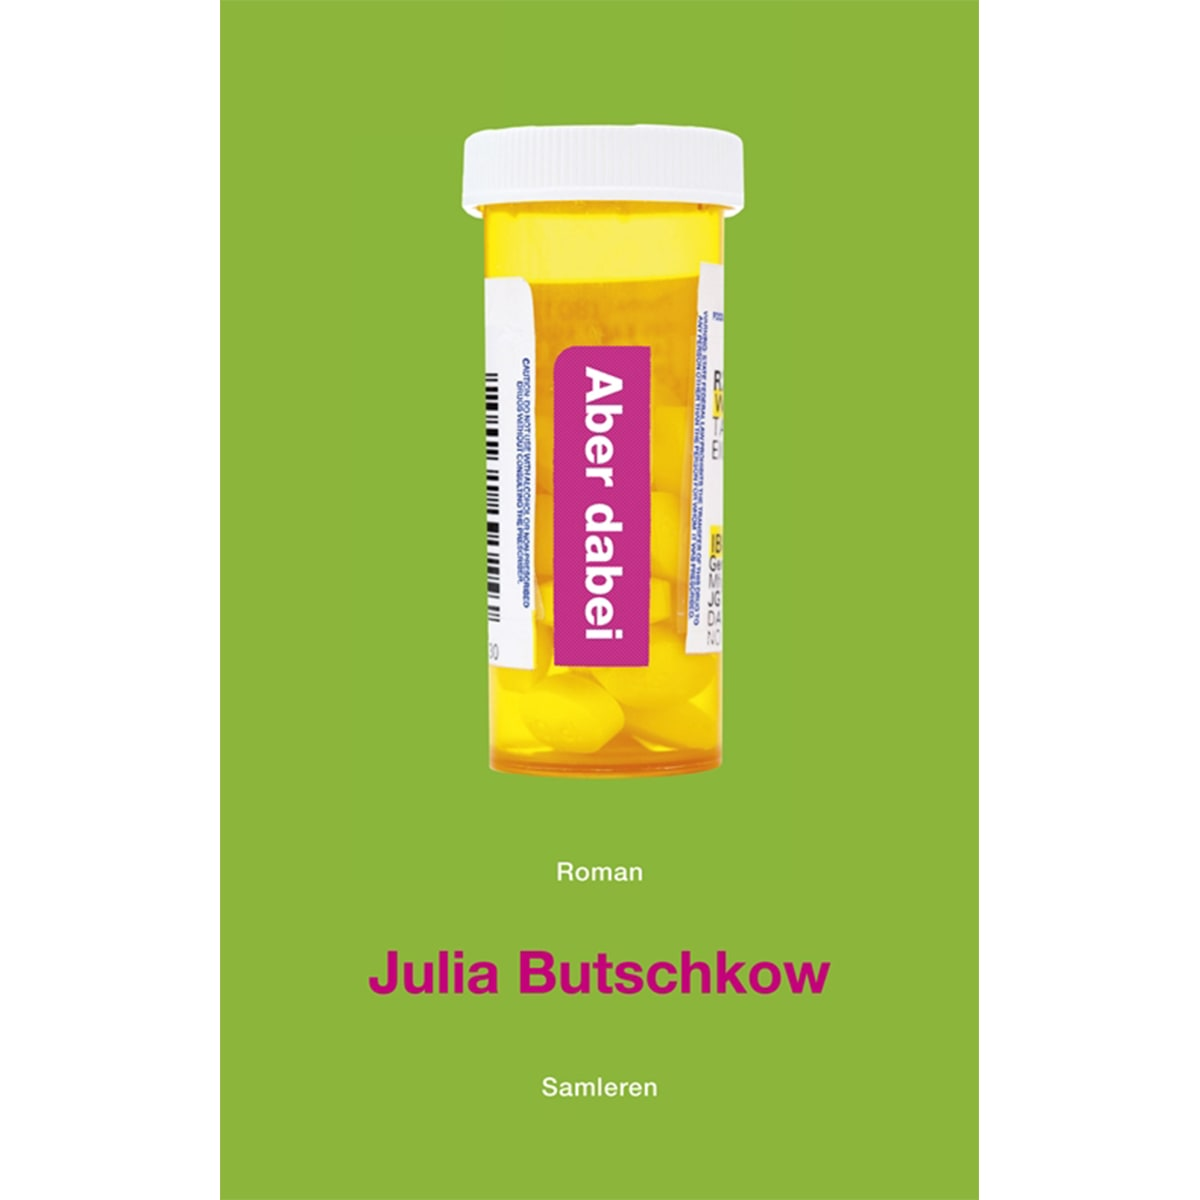 Af Julia Butschkow